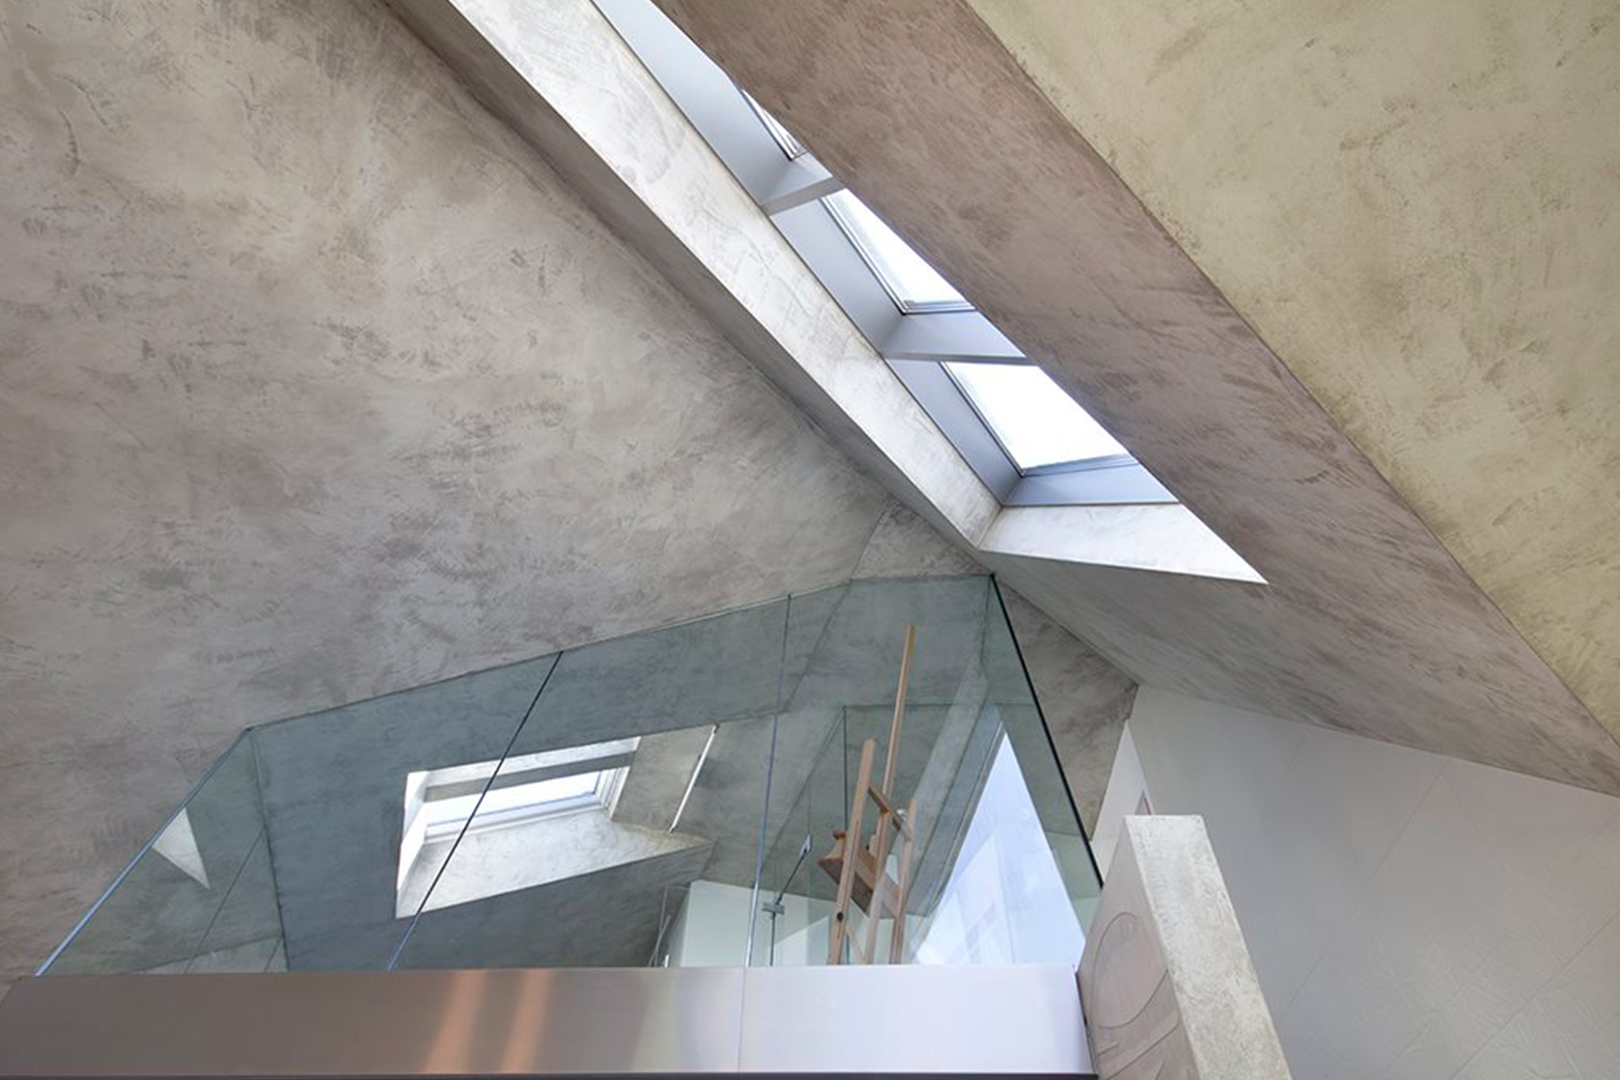 seci-blog-pohledovy-beton-1